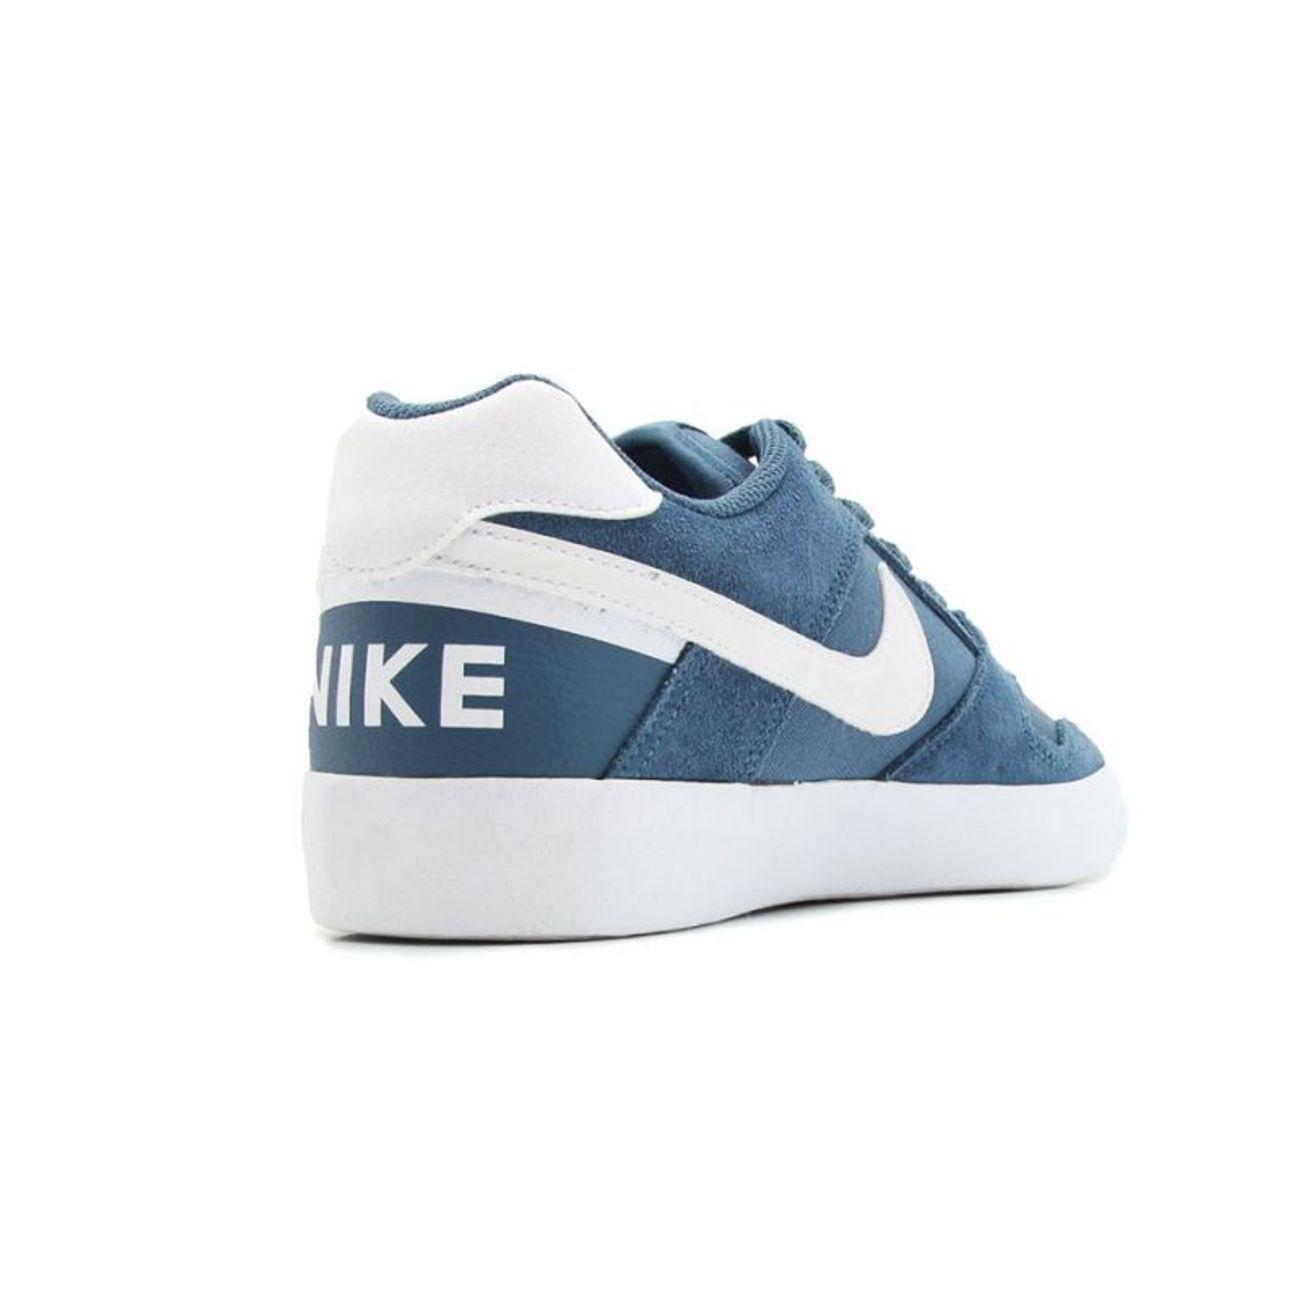 Azul Adulte Nike Zoom Sb 401 Force Vulc Ni942237 Padel Delta dCxQthBsr